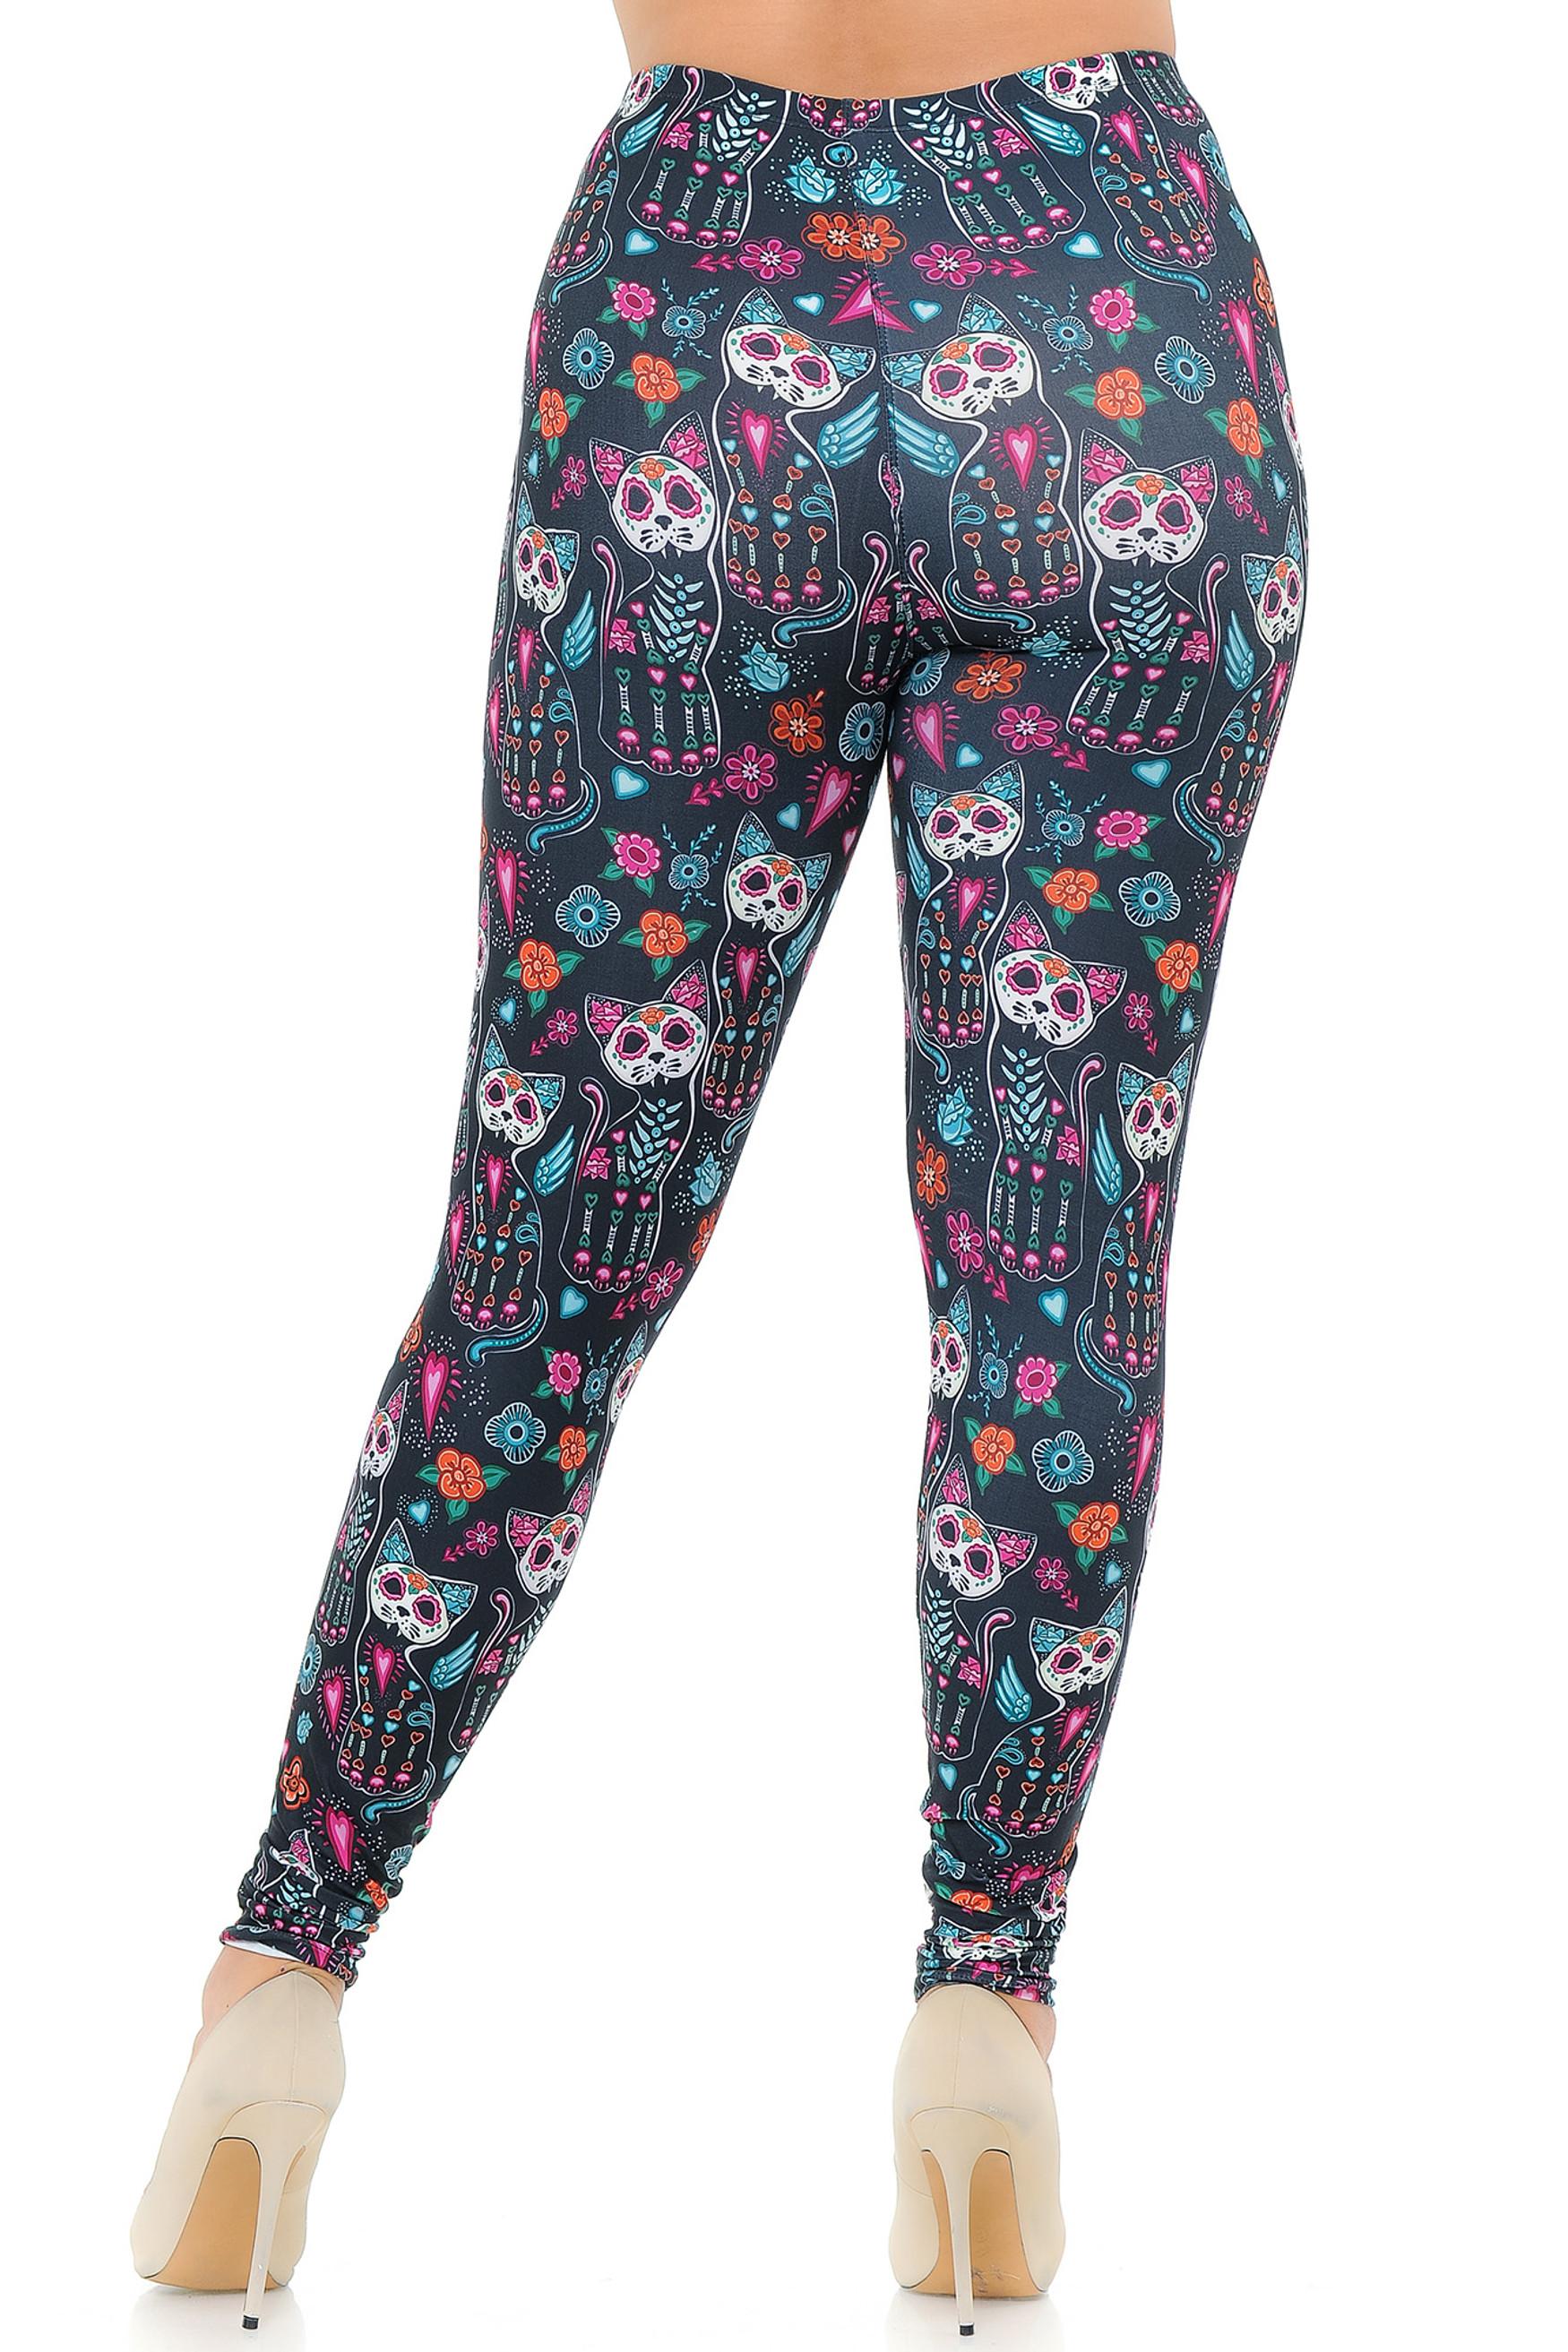 Creamy Soft Sugar Skull Kitty Cats Extra Plus Size Leggings - 3X-5X - USA Fashion™